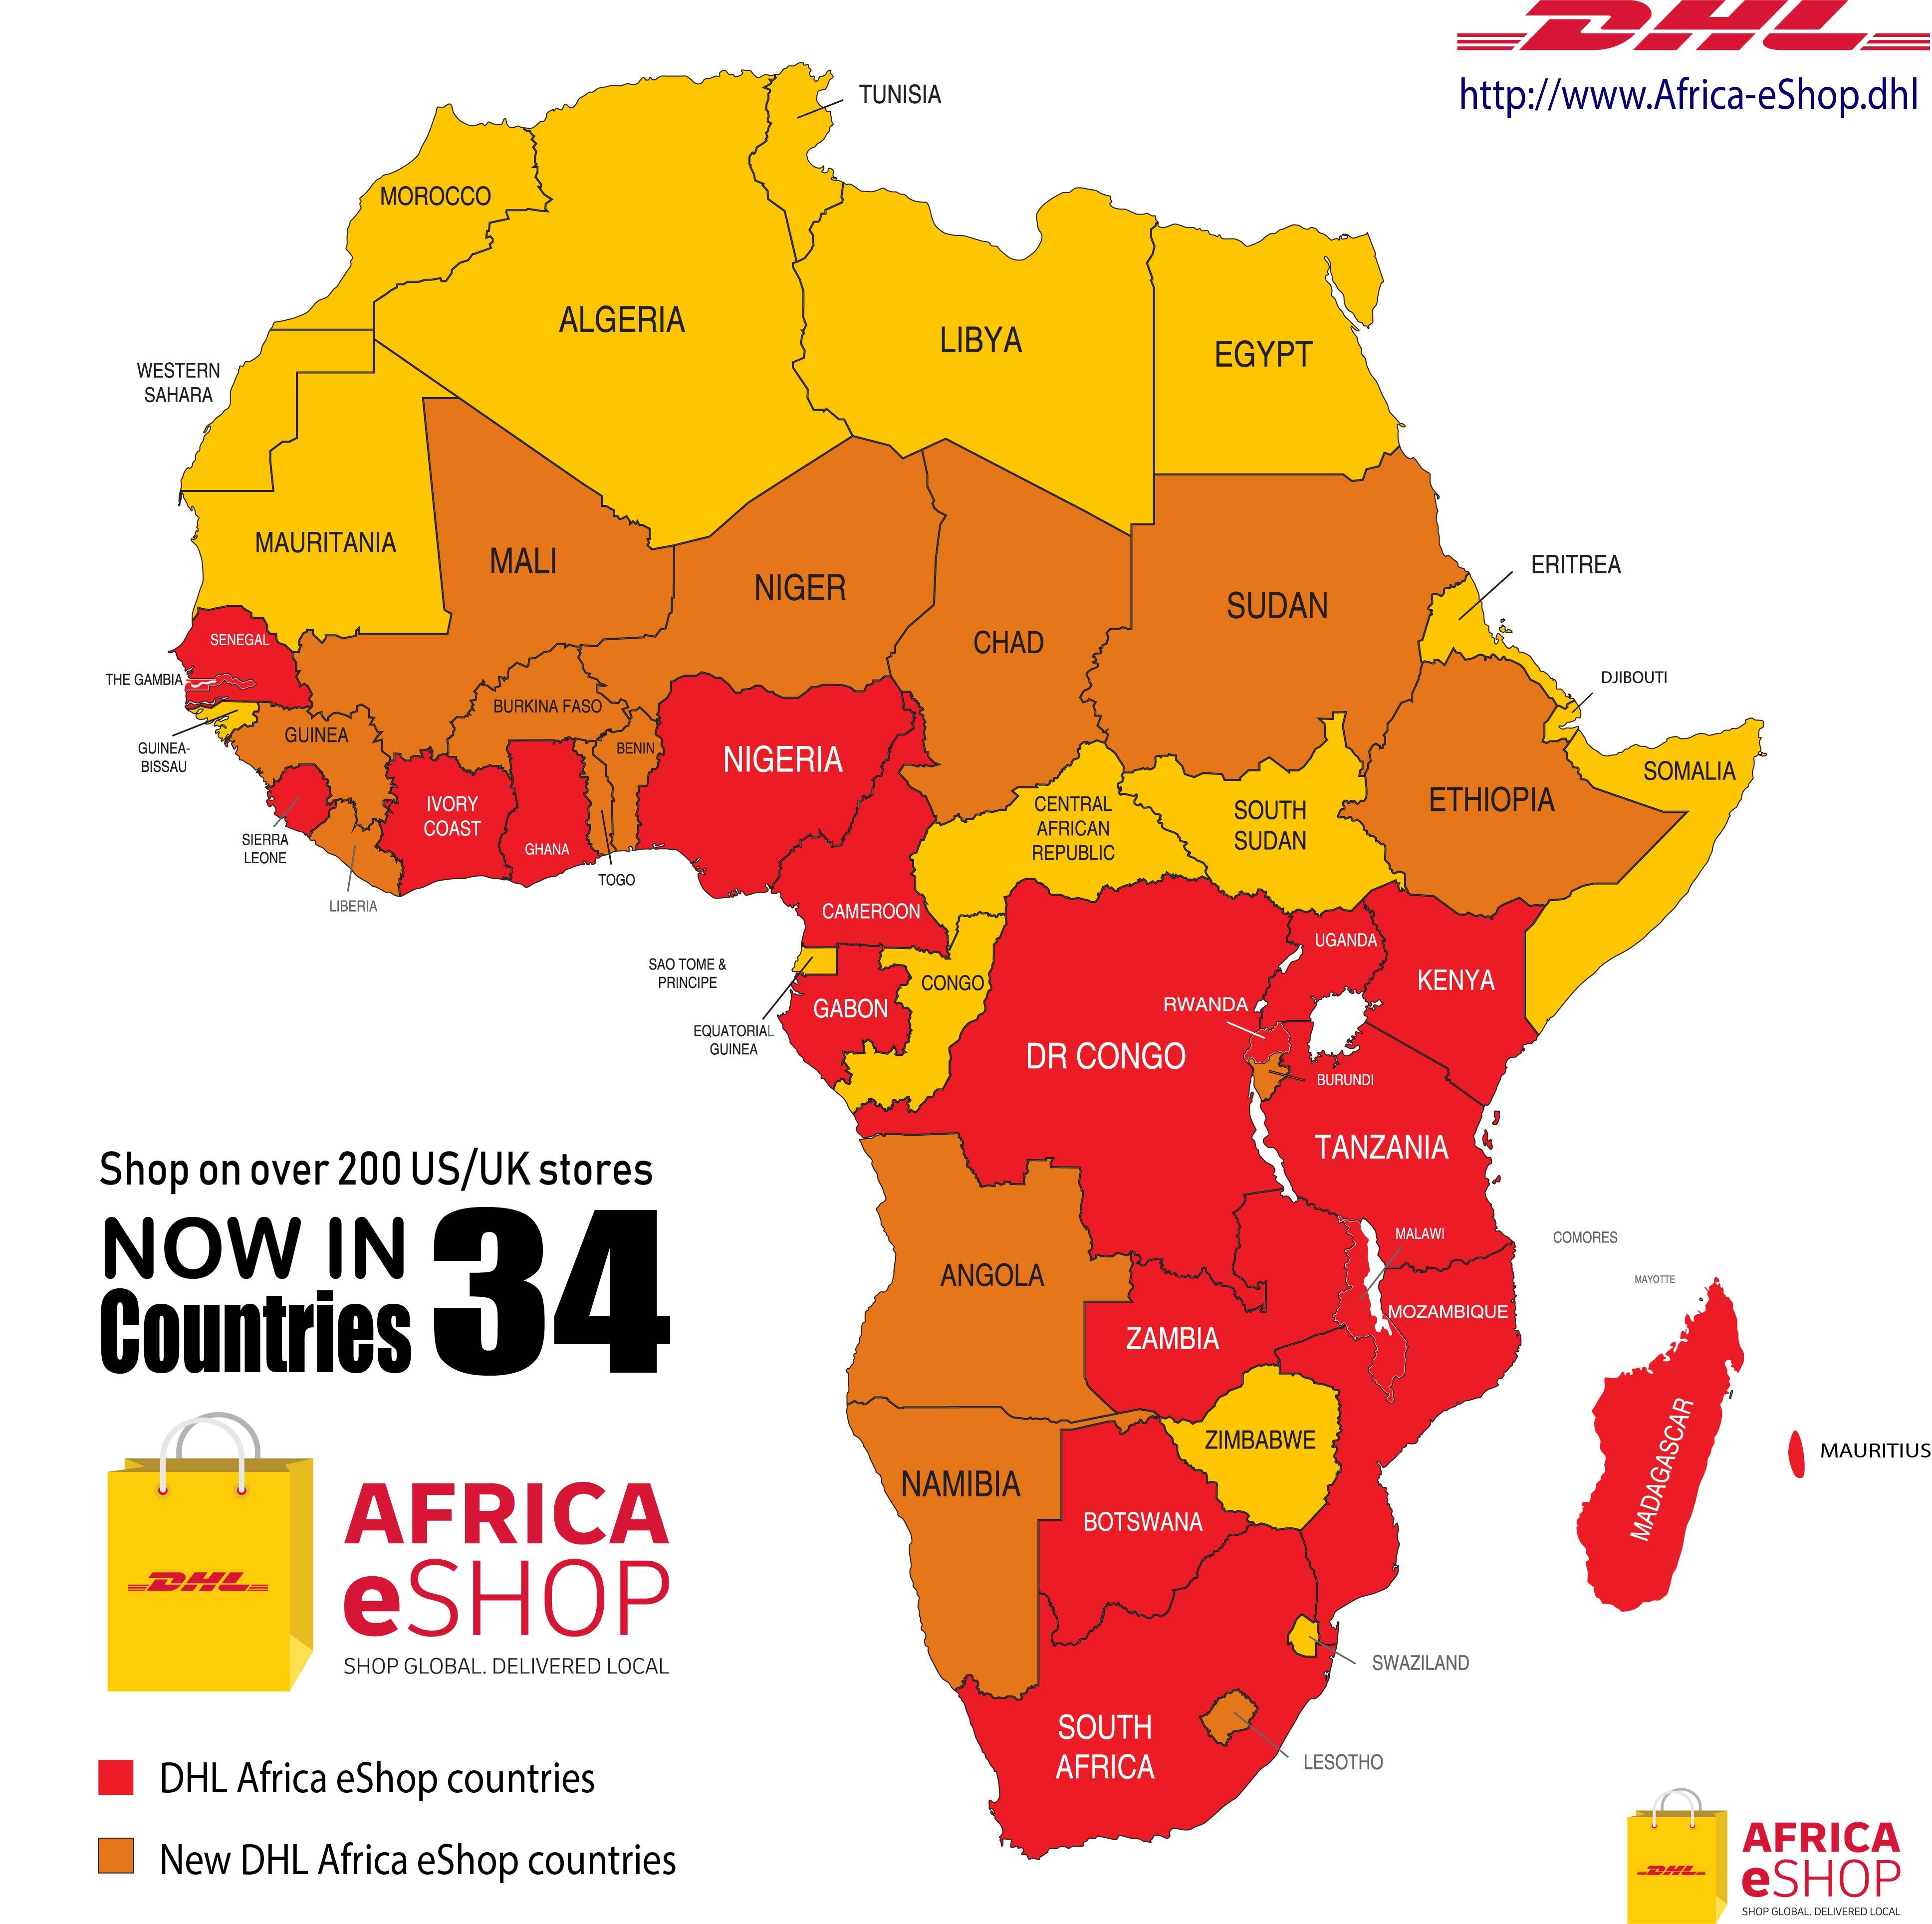 DHL AFRICA ESHOP MAP